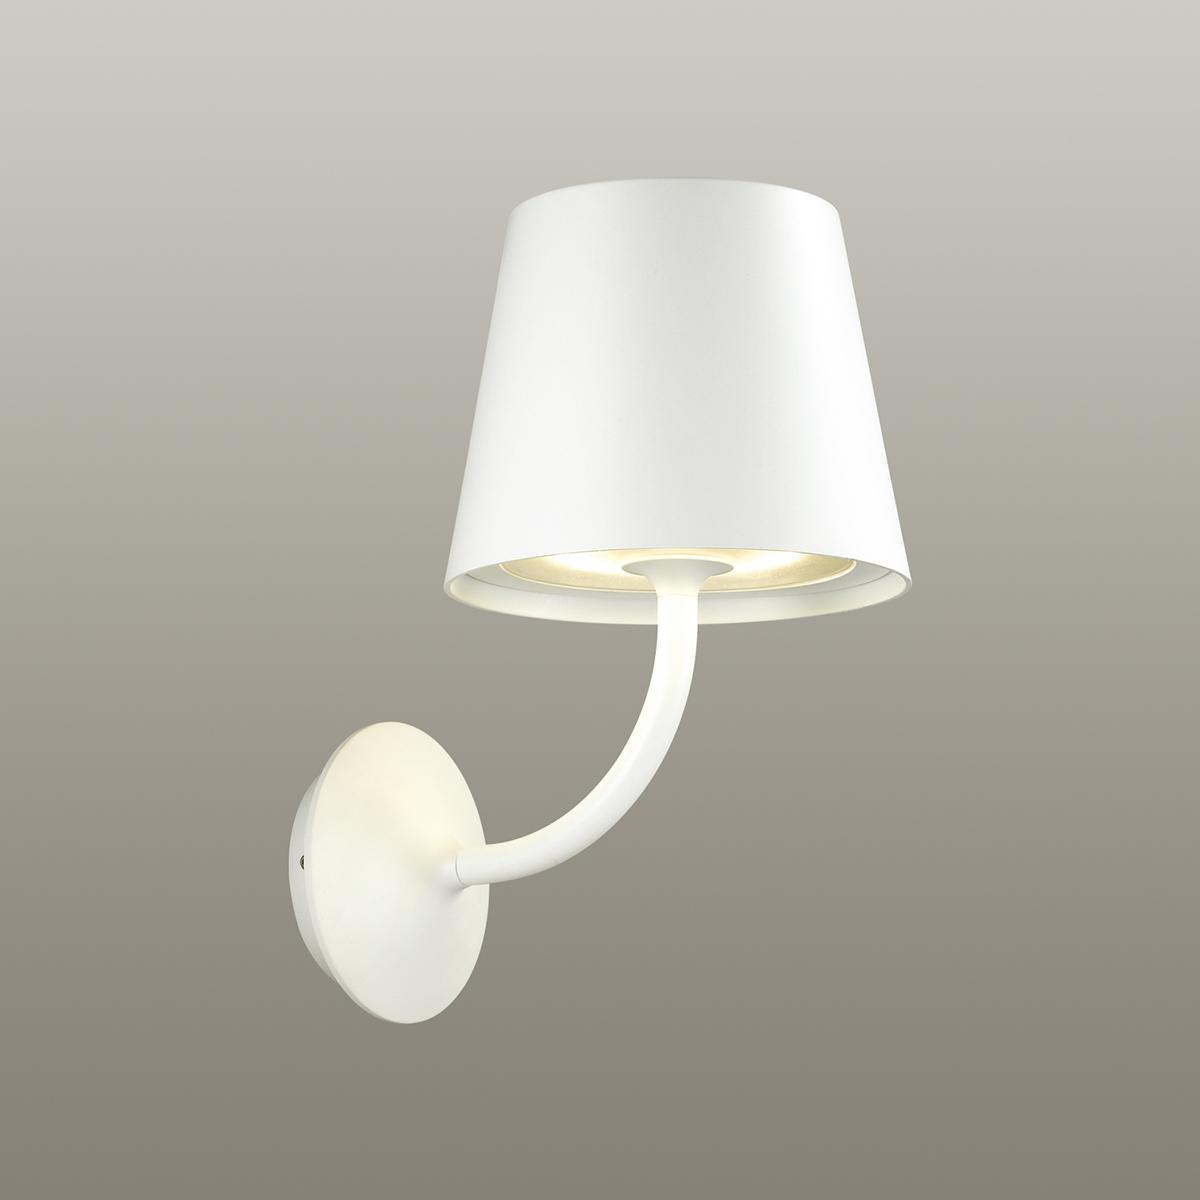 Светодиодное бра Odeon Light Elin 4609/7WL, IP65, LED 7W 3000K 555lm, белый, металл, стекло - фото 2